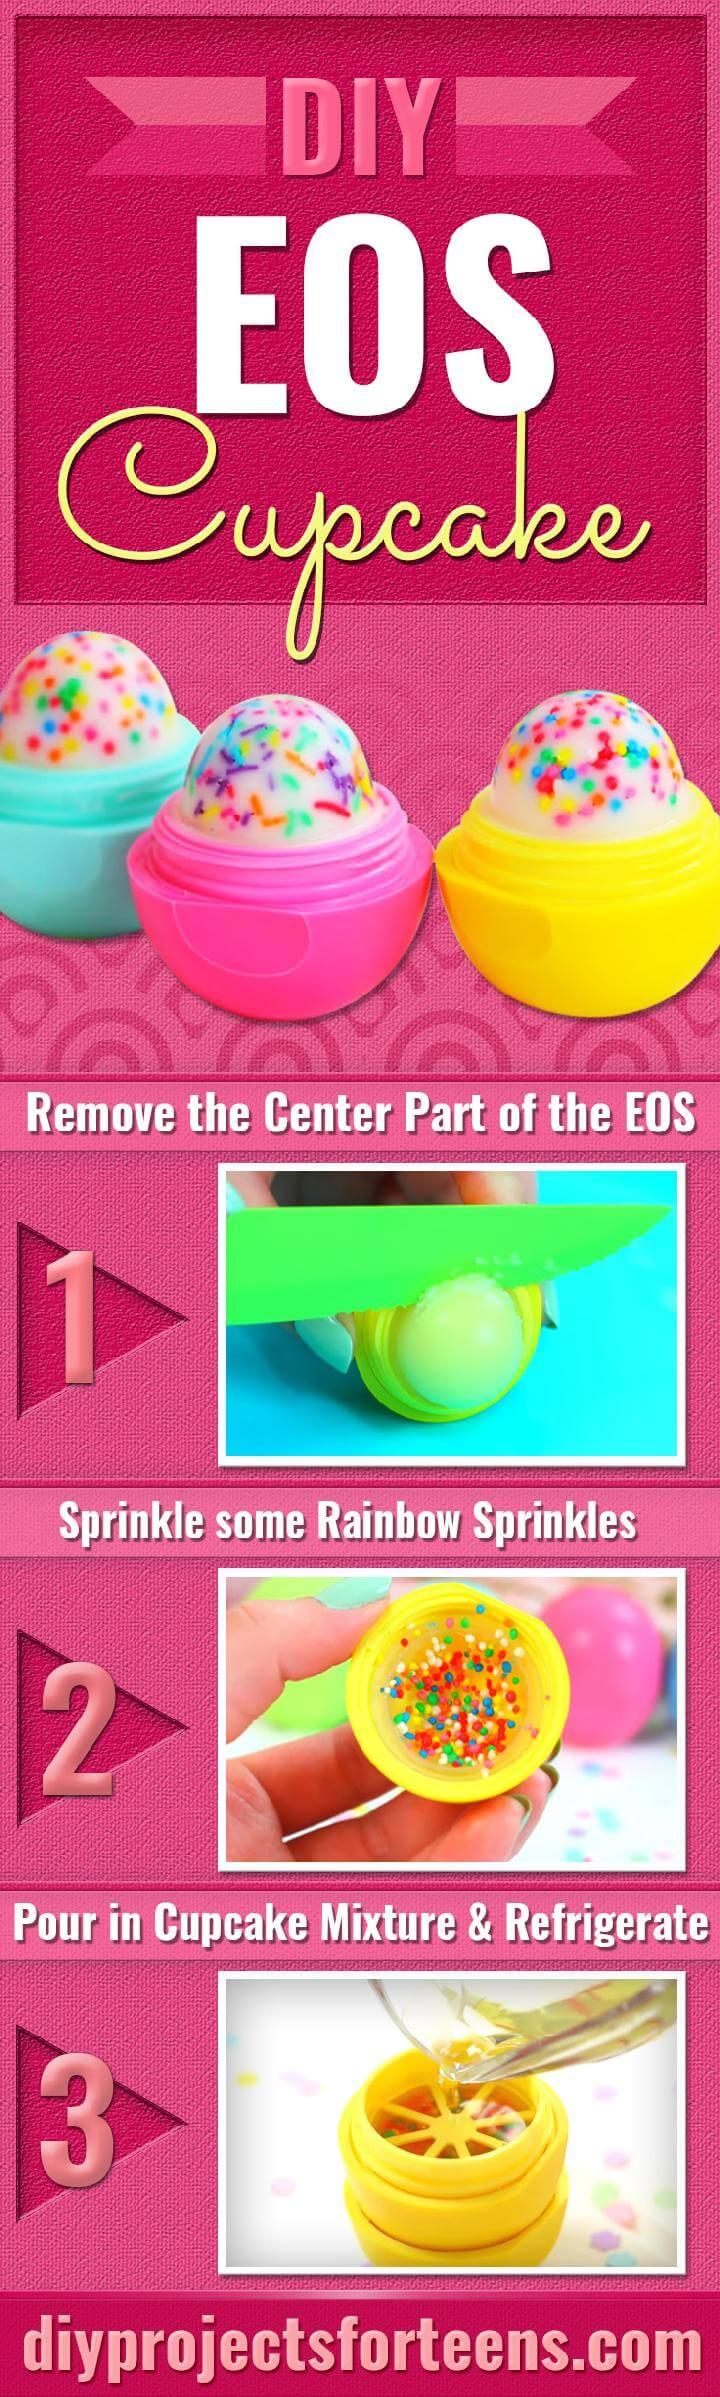 DIY Eos Lipbalm Cupcake Teen Craft